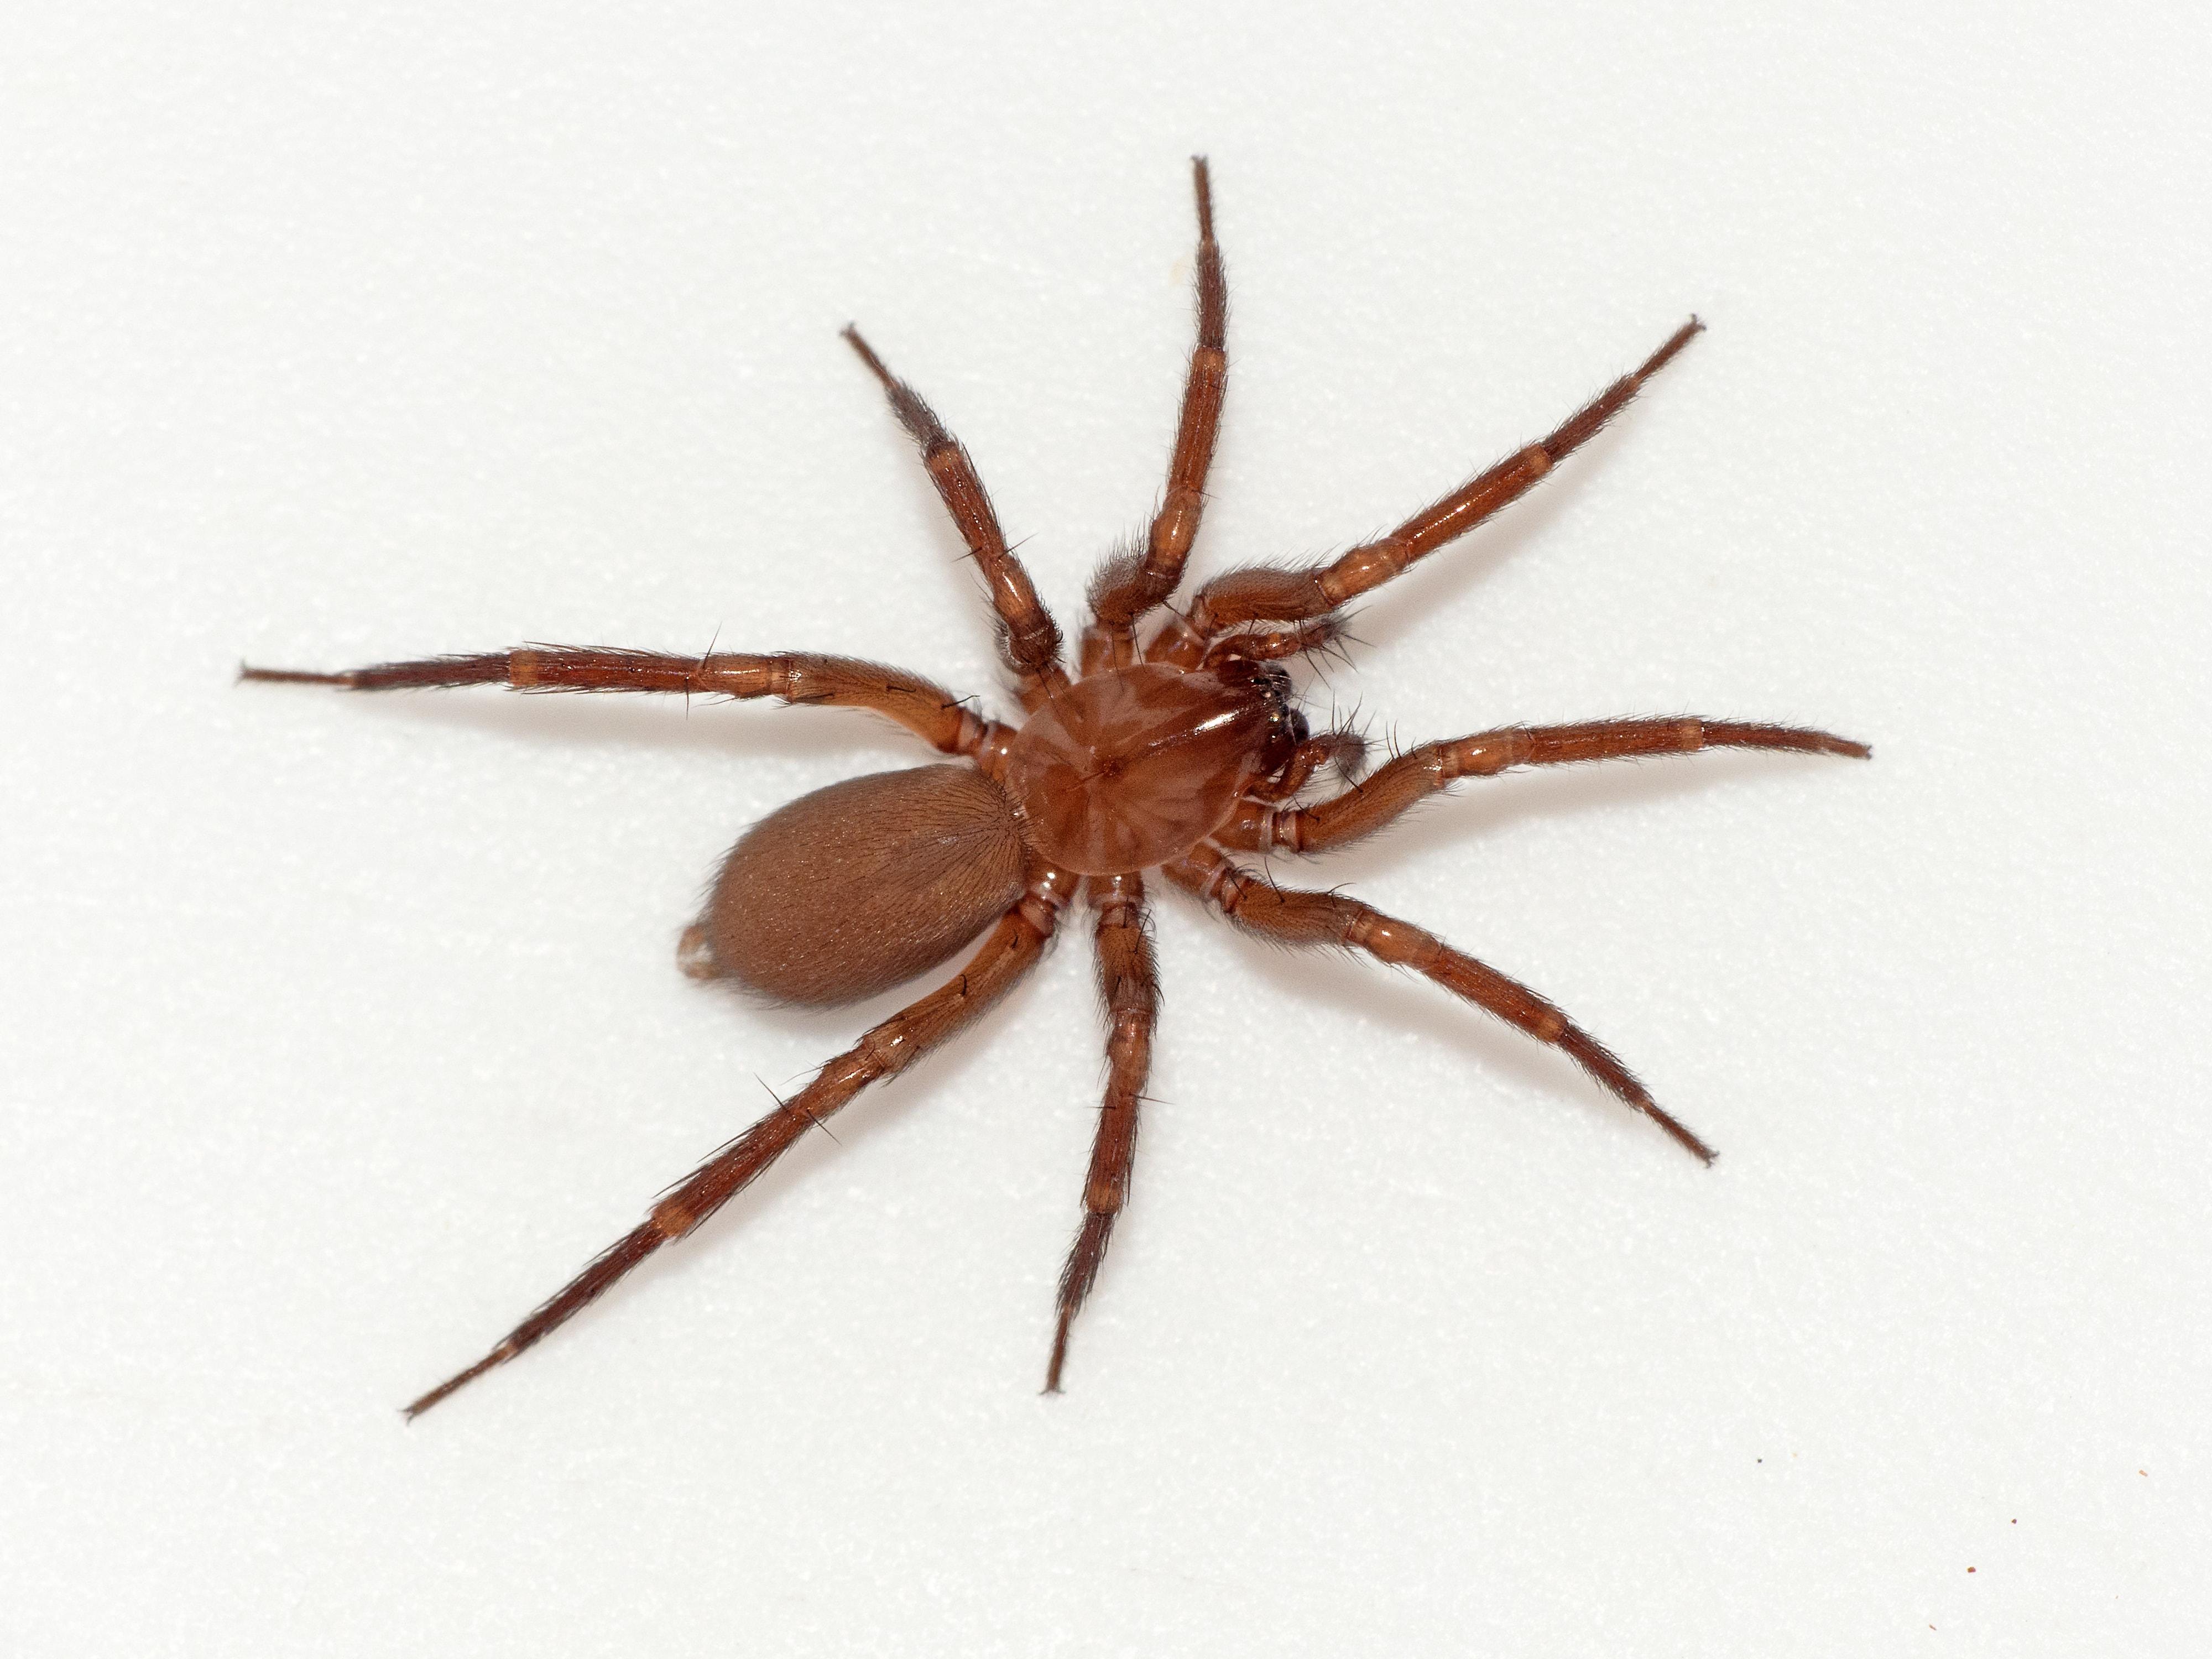 Picture of Cicurina simplex - Female - Dorsal